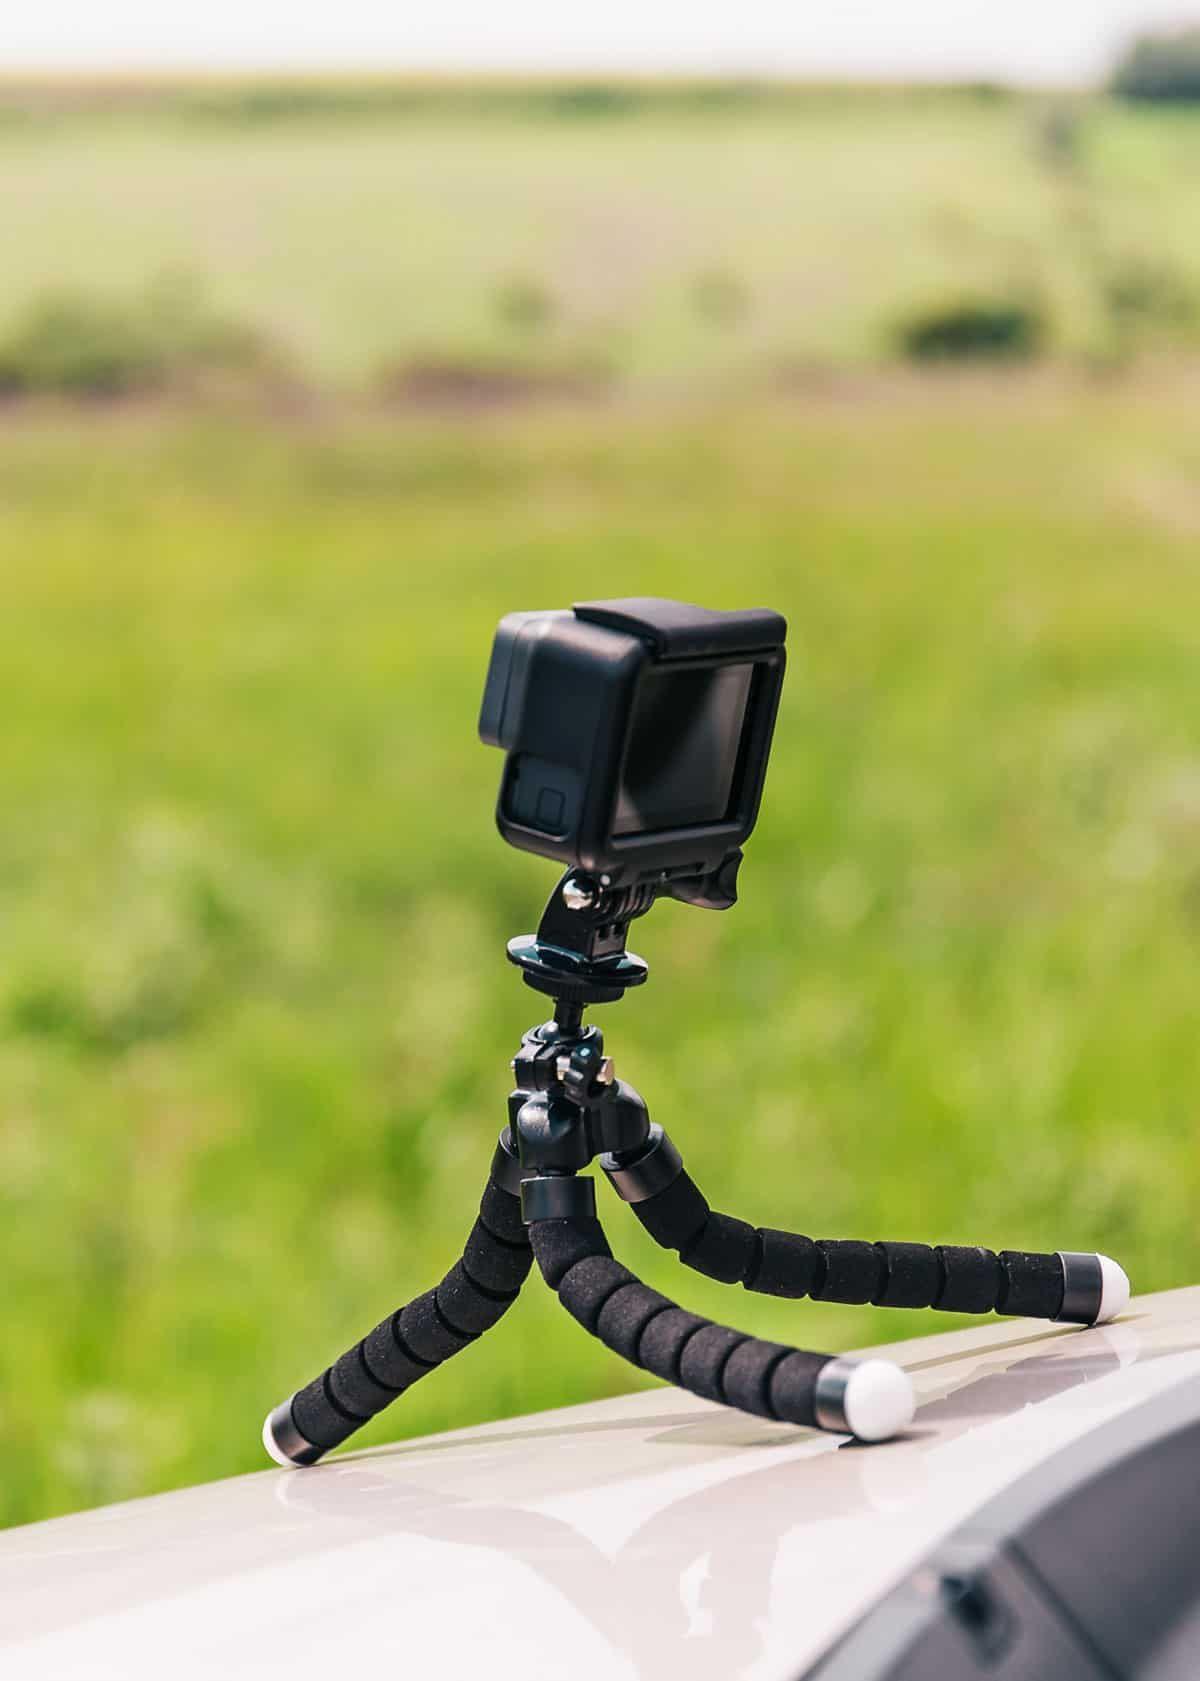 41 Best GoPro Accessories in 2020 Vlogging Gear for